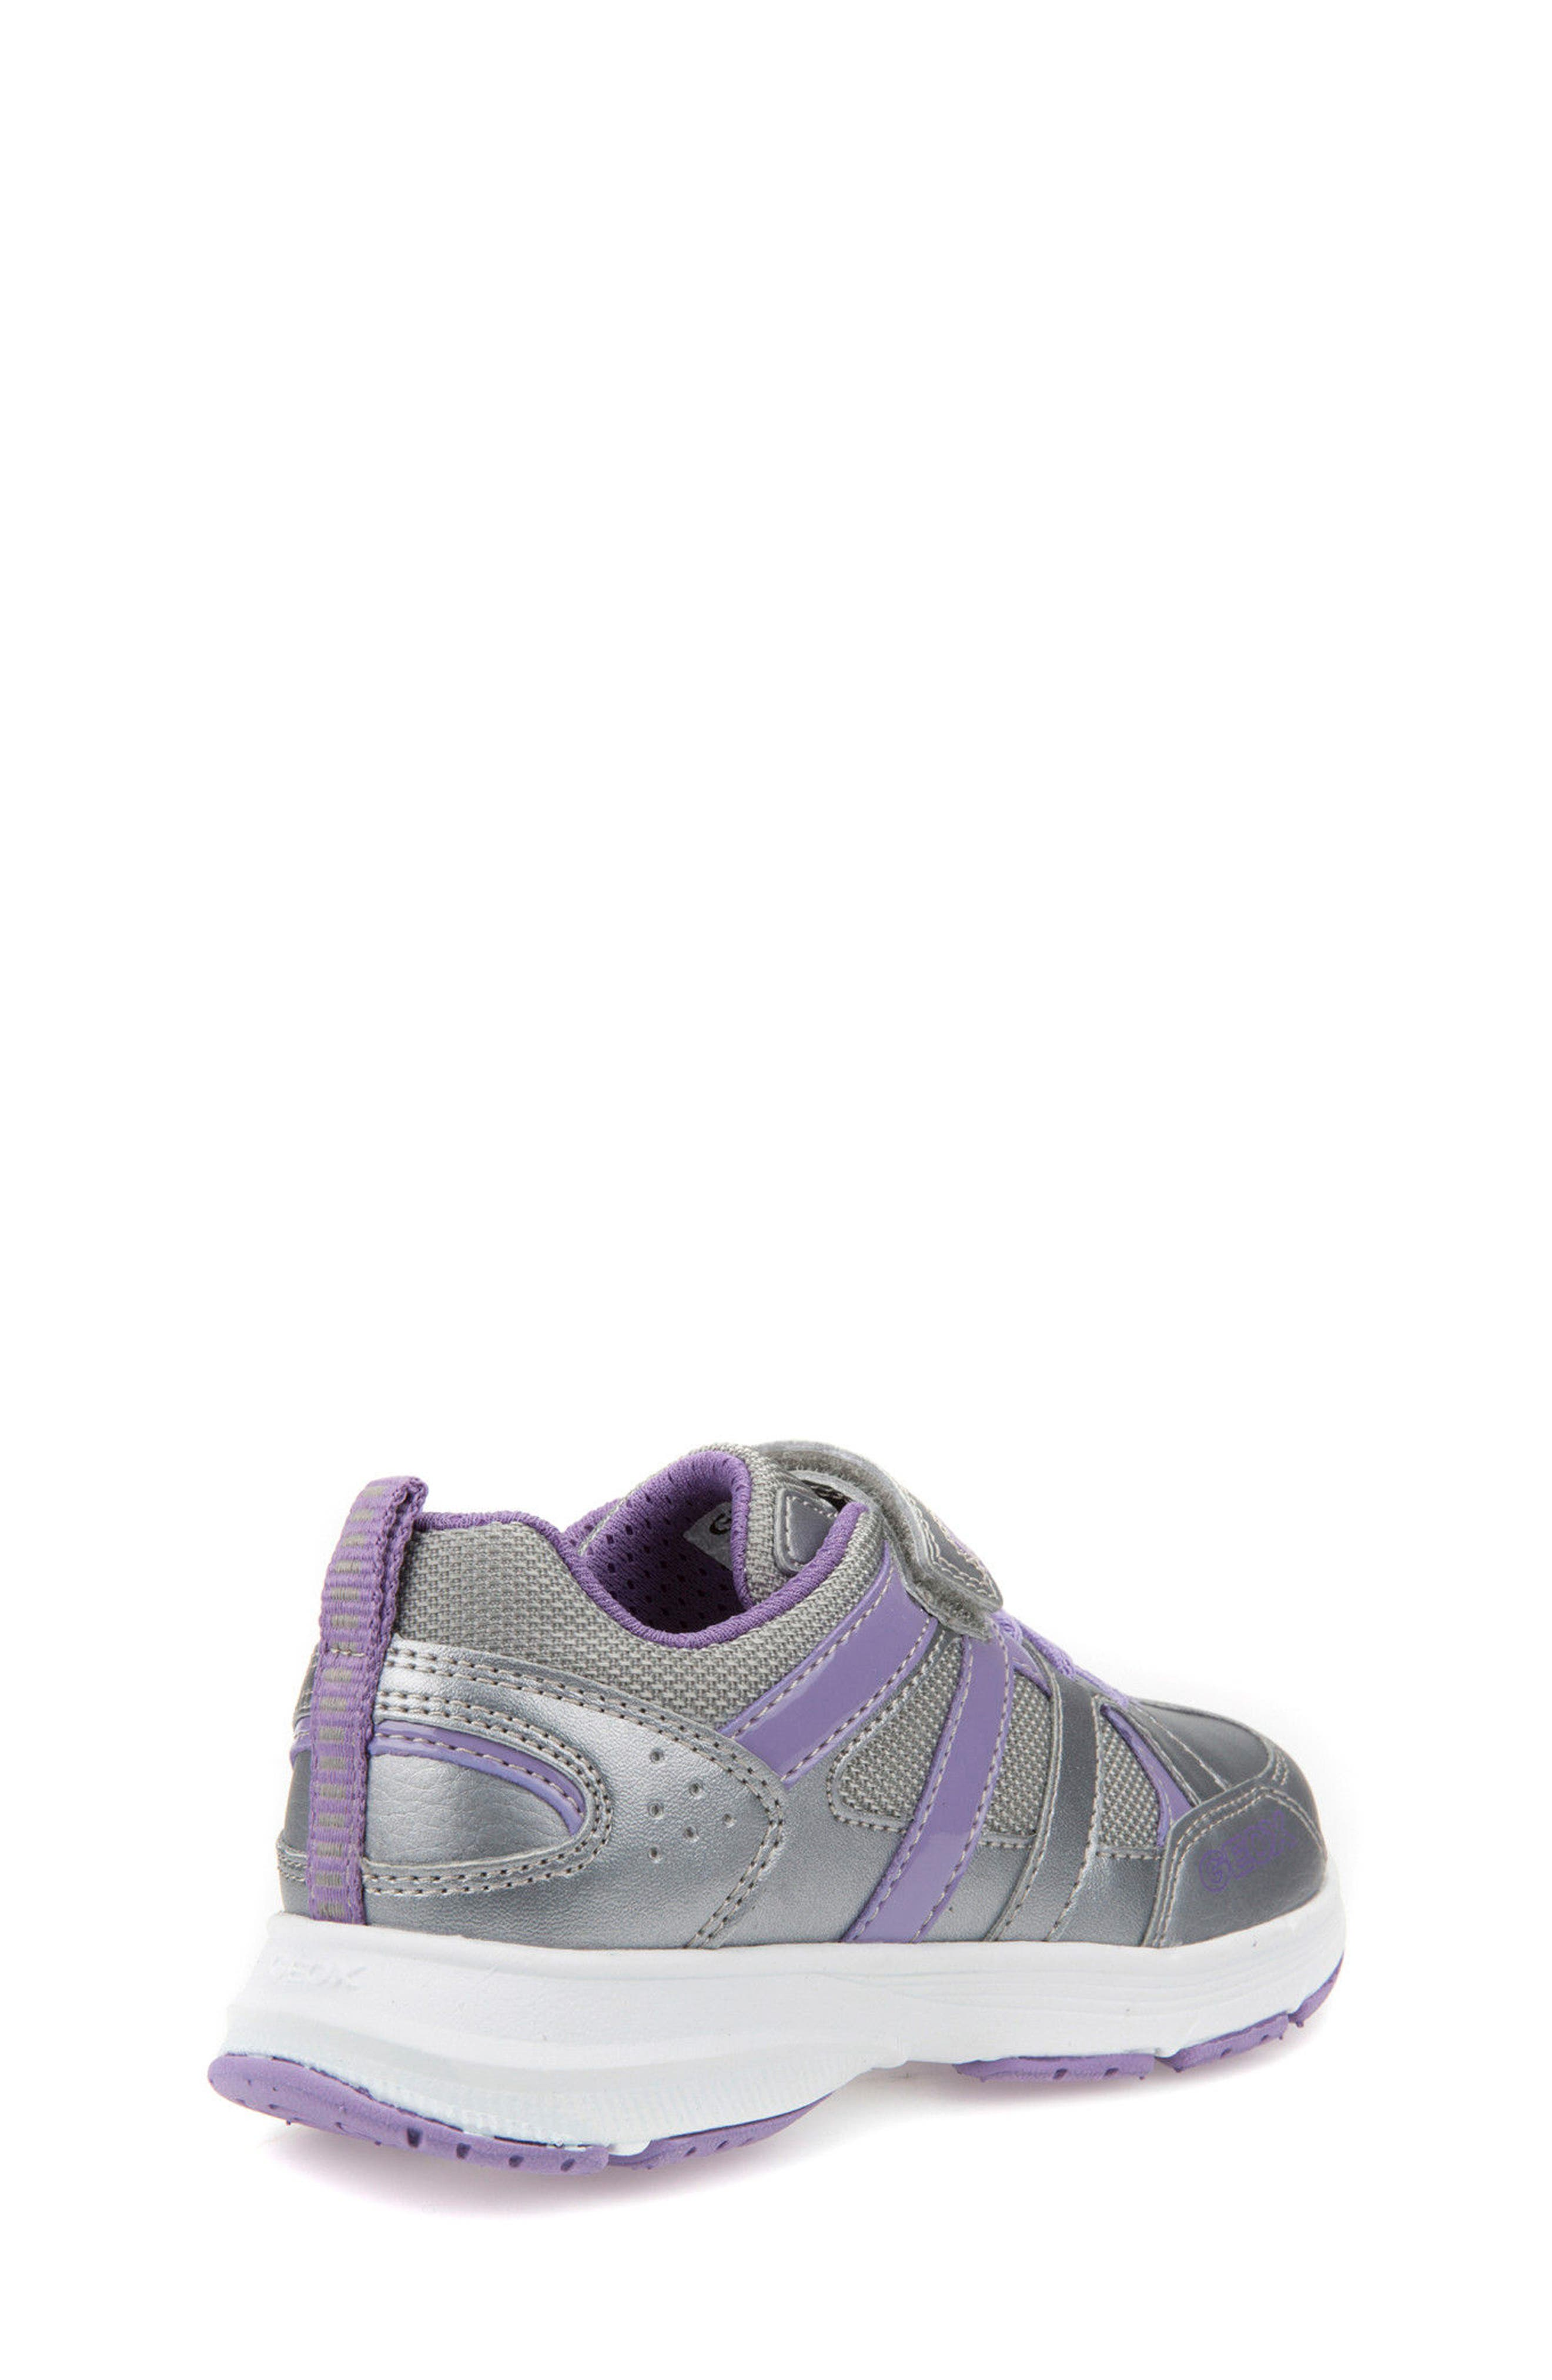 Top Fly Sneaker,                             Alternate thumbnail 2, color,                             040